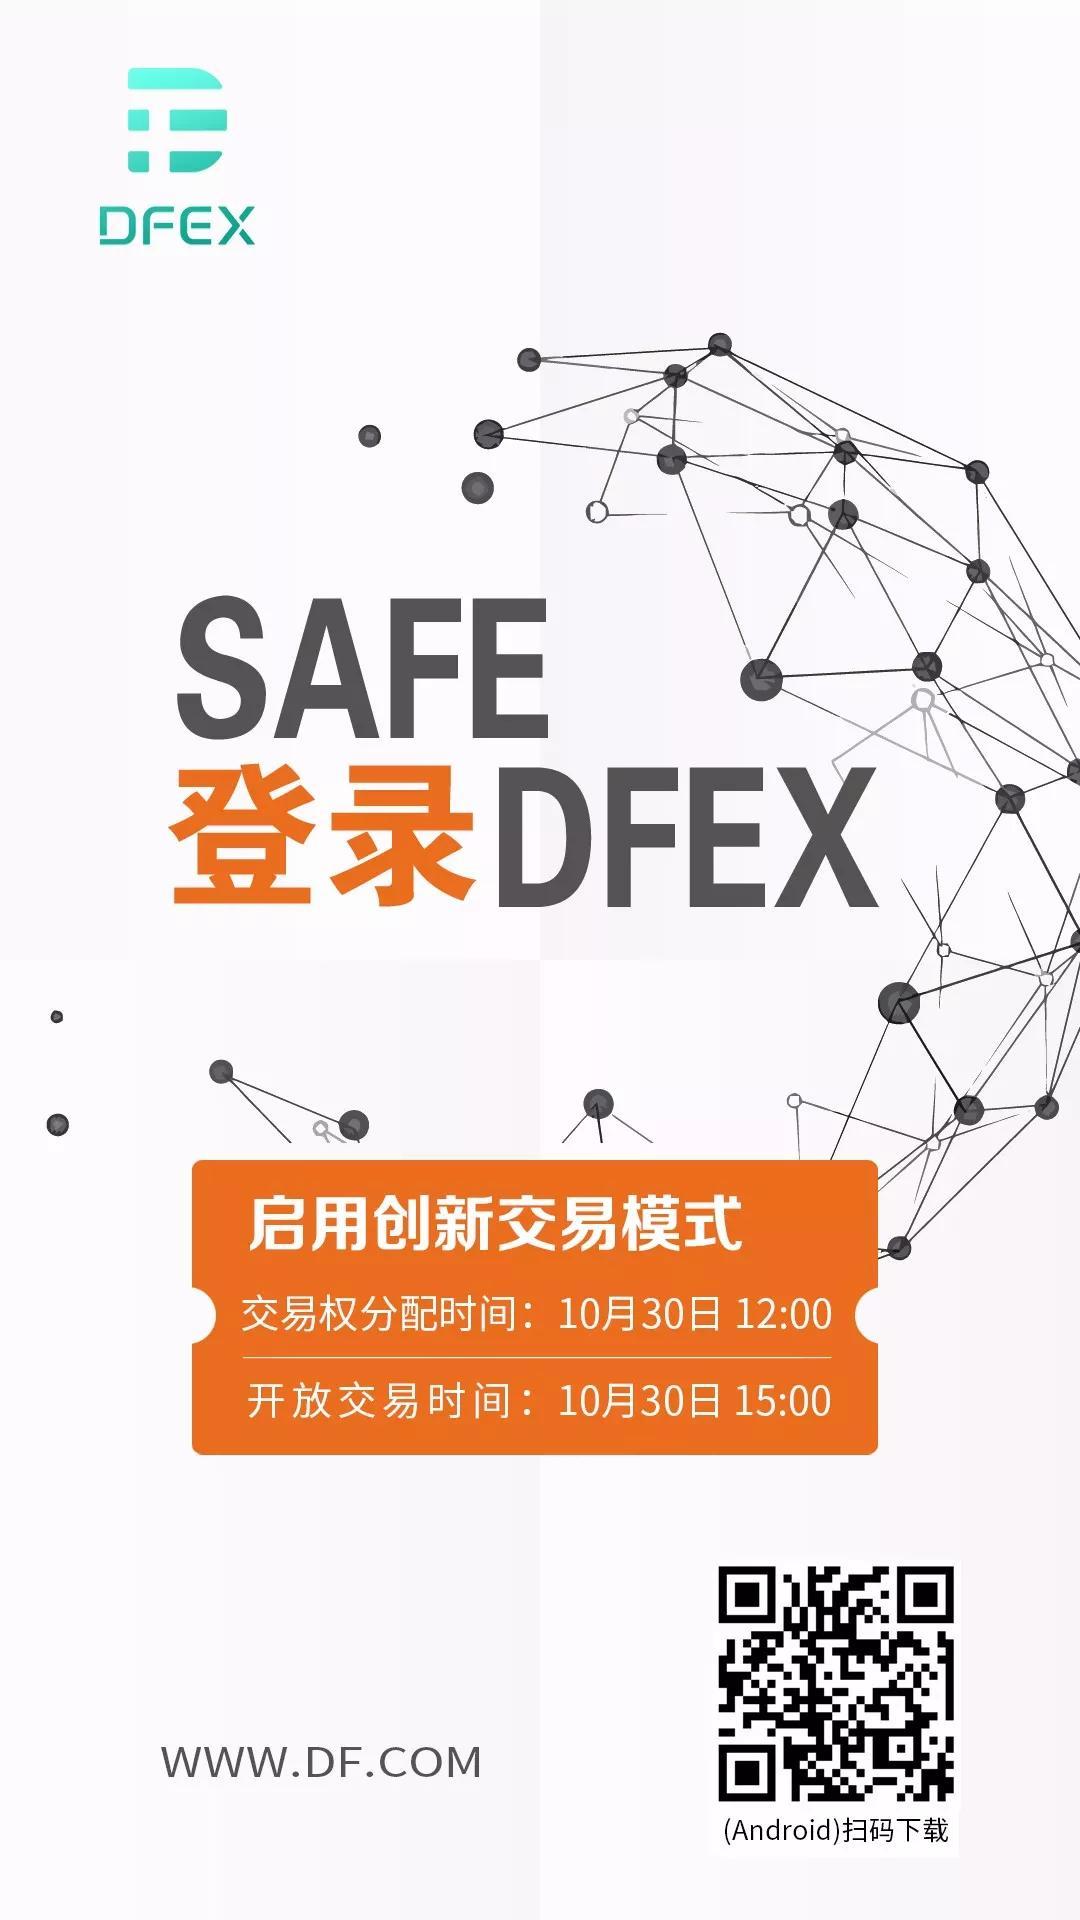 "SAFE上线""ZM-DFEX创新交易模式"""